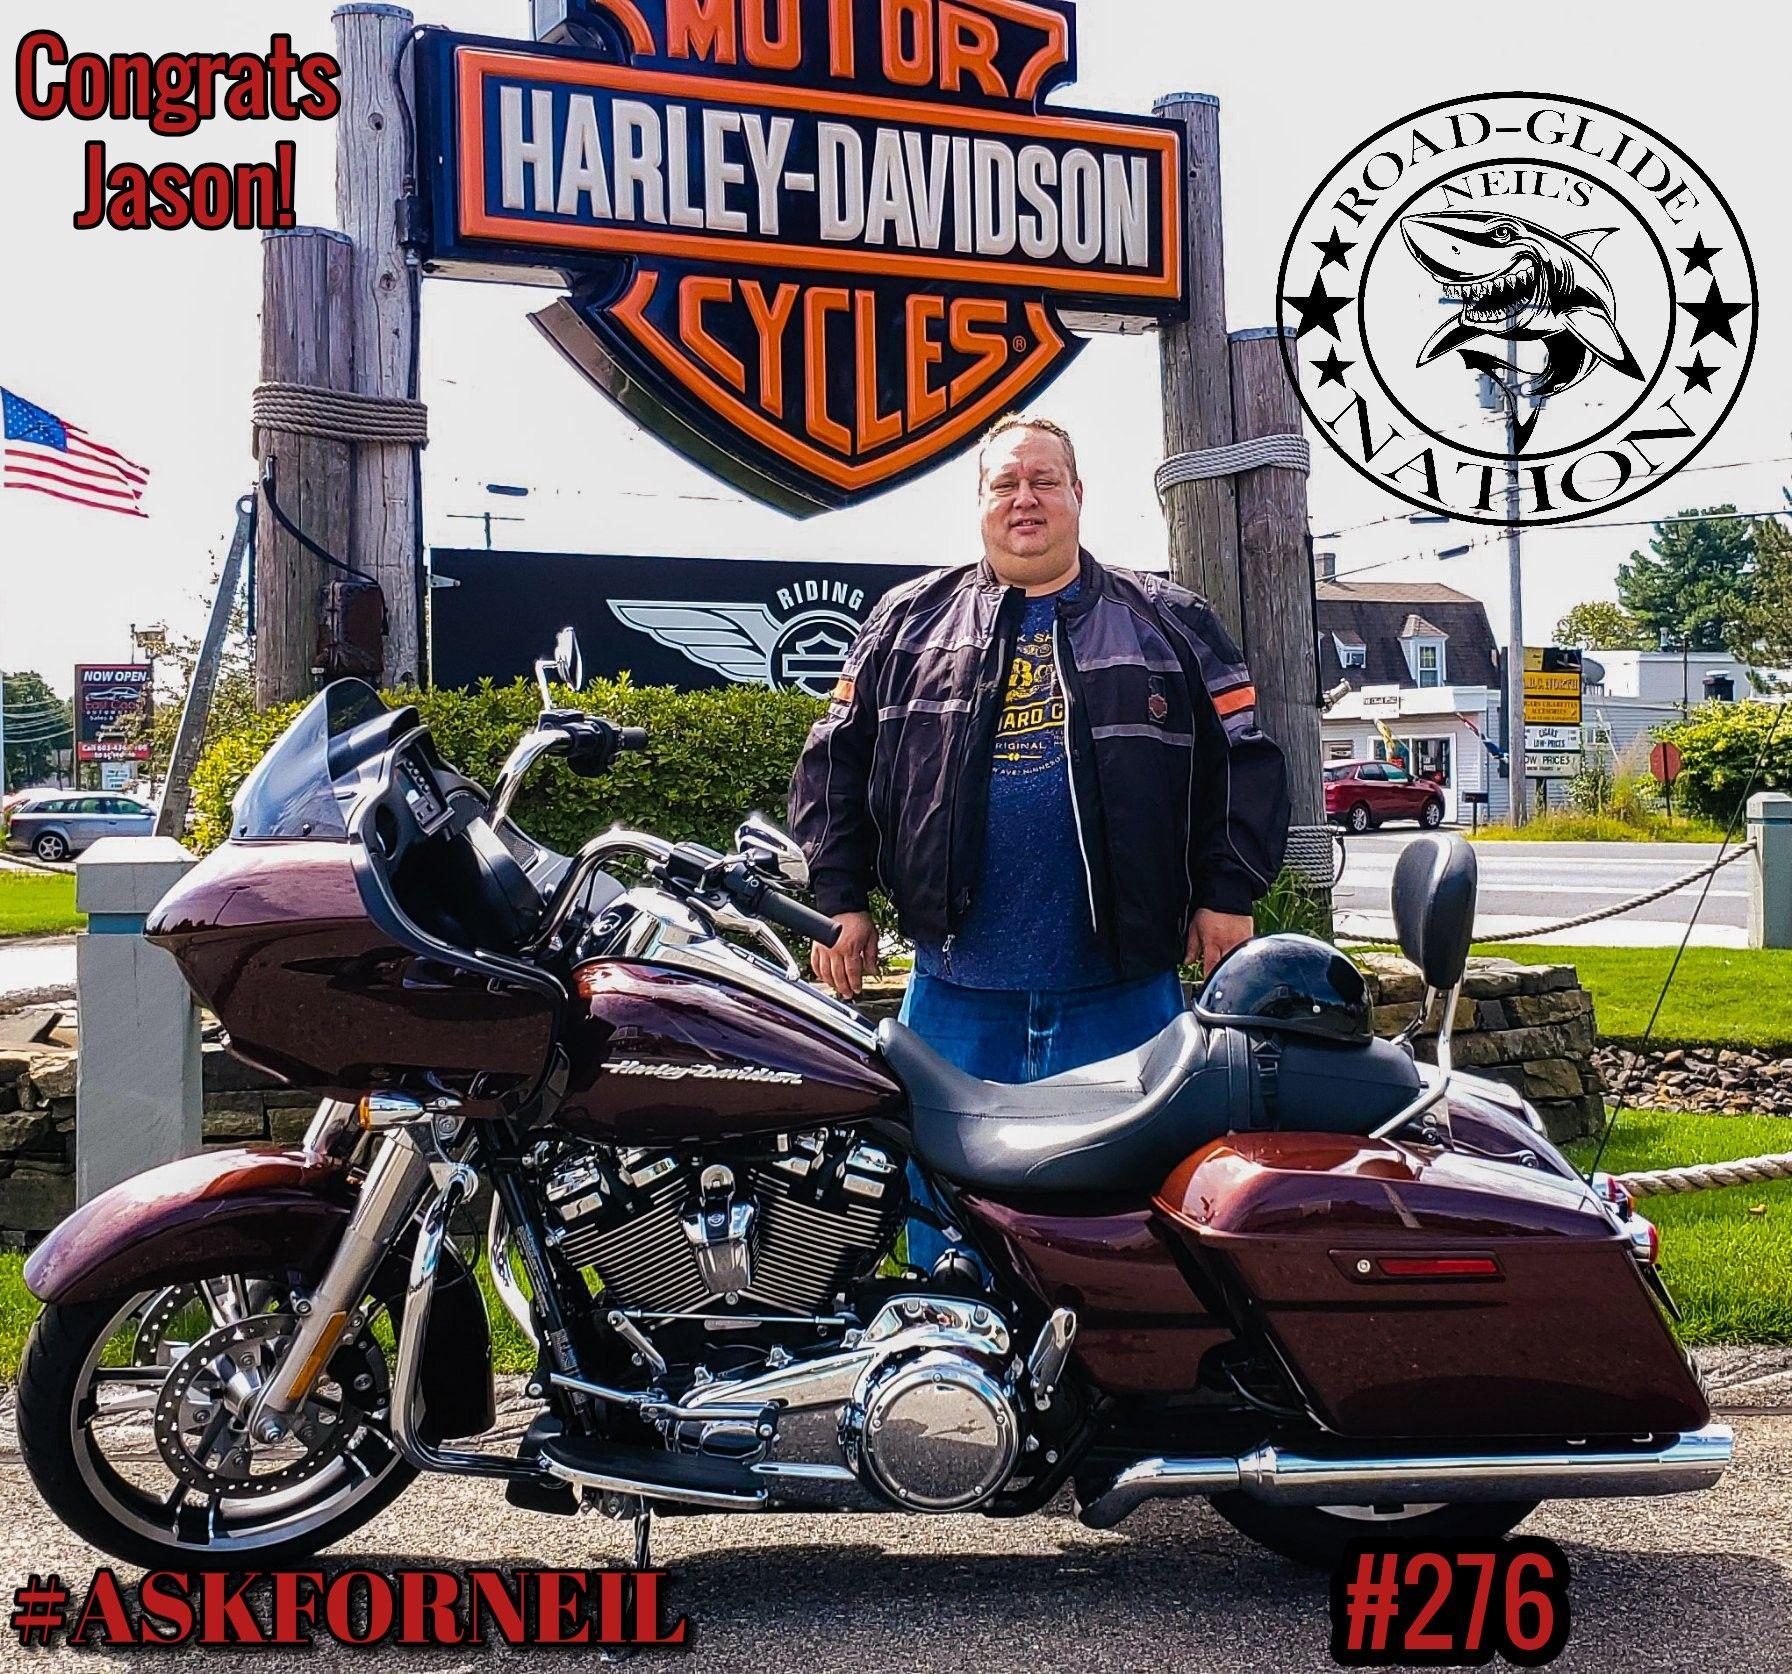 Pin by Neil_Sells_Harleys on HD Pins Harley davidson